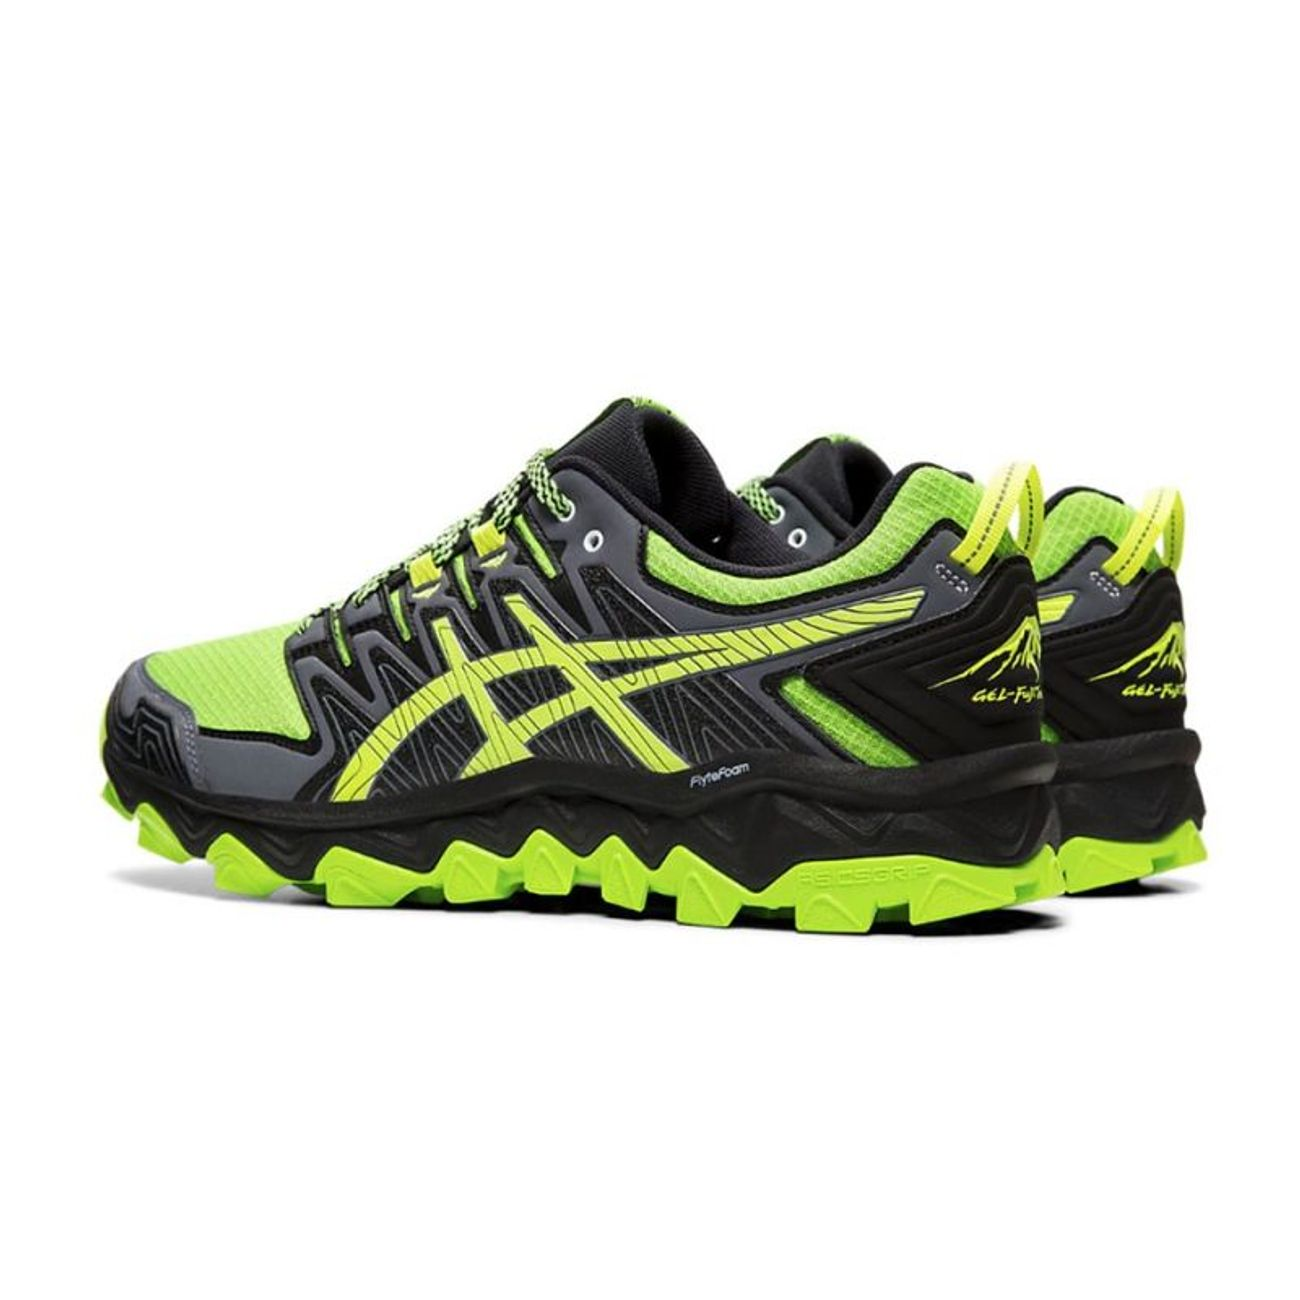 Adulte 1011a197 Negro Asics Fujitrabuco Verde 7 Running Gel 300 nOkPN80wX